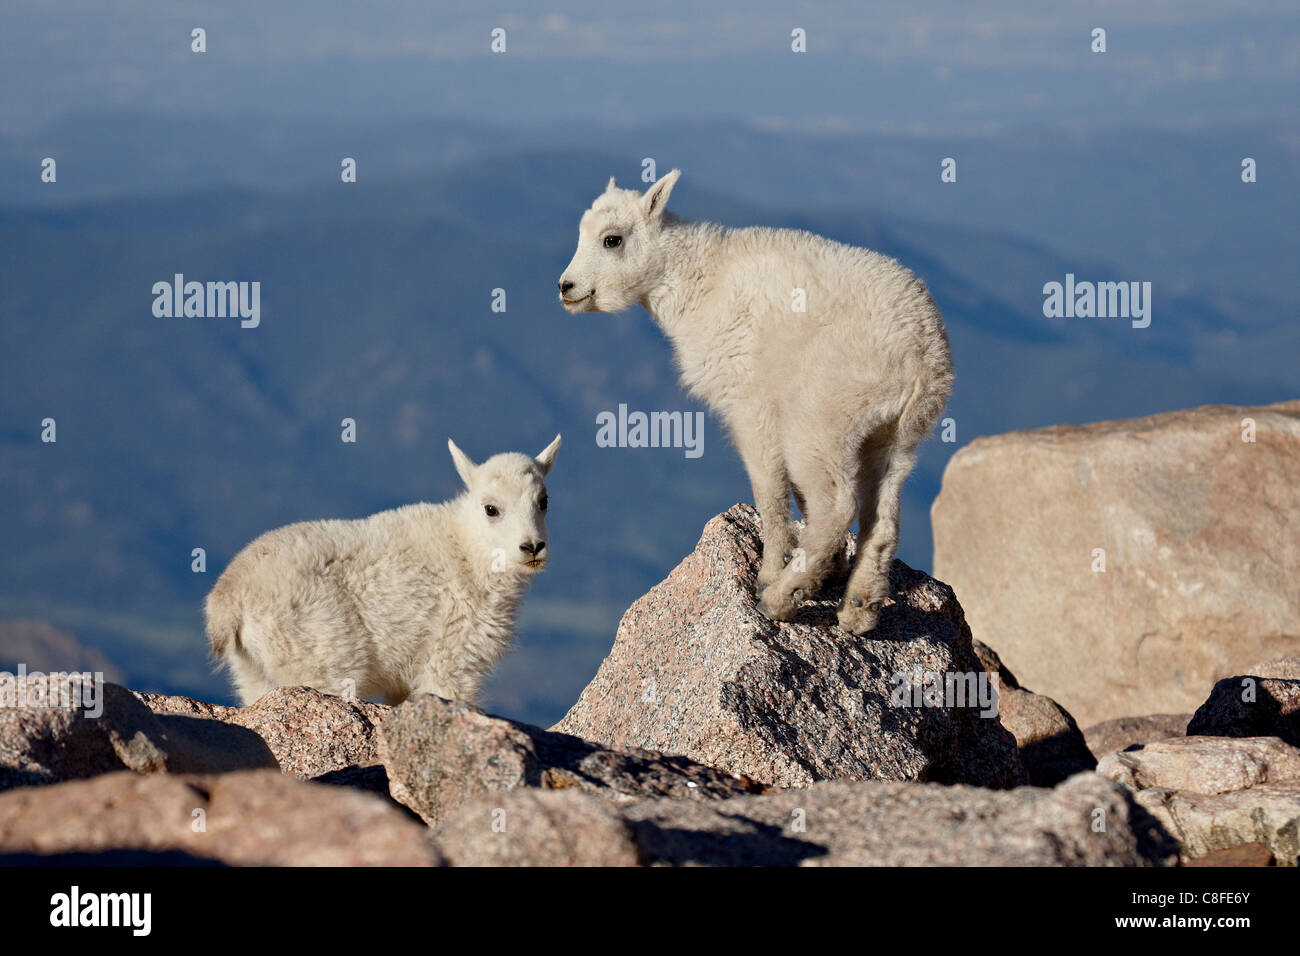 Two mountain goat (Oreamnos americanus) kids, Mount Evans, Colorado, United States of America - Stock Image